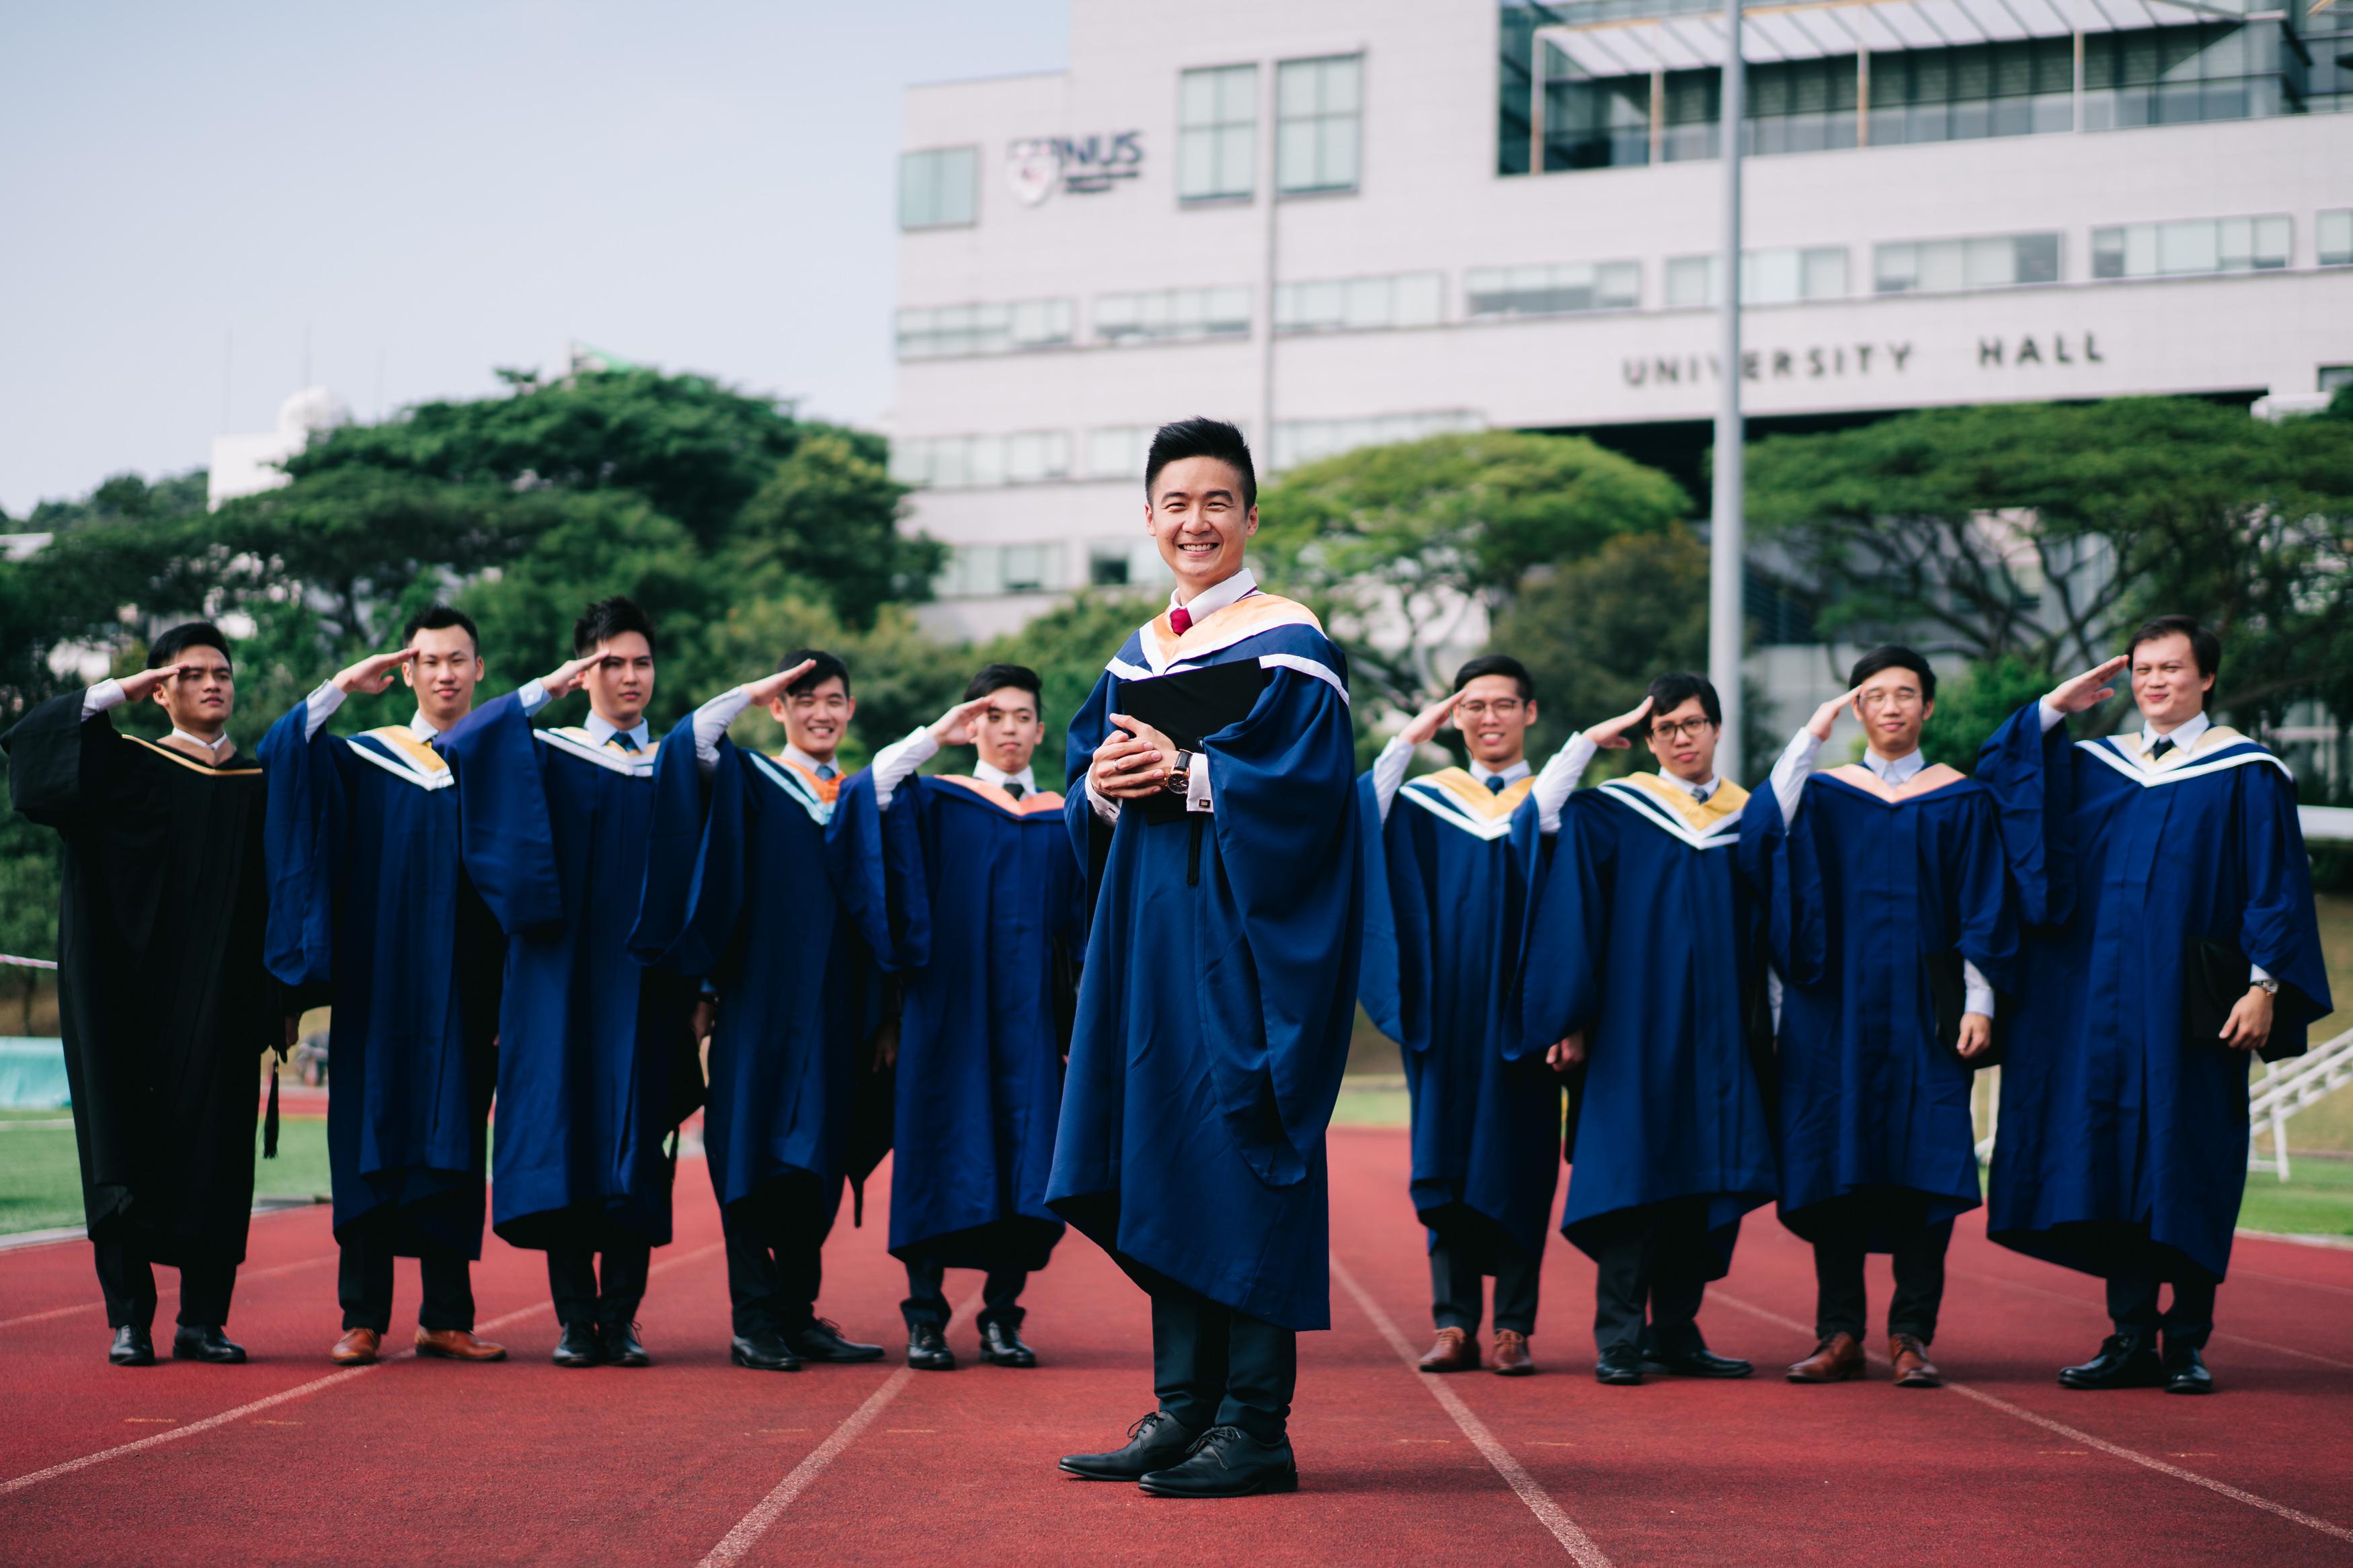 20180729-Graduation - KX & Friends -148.